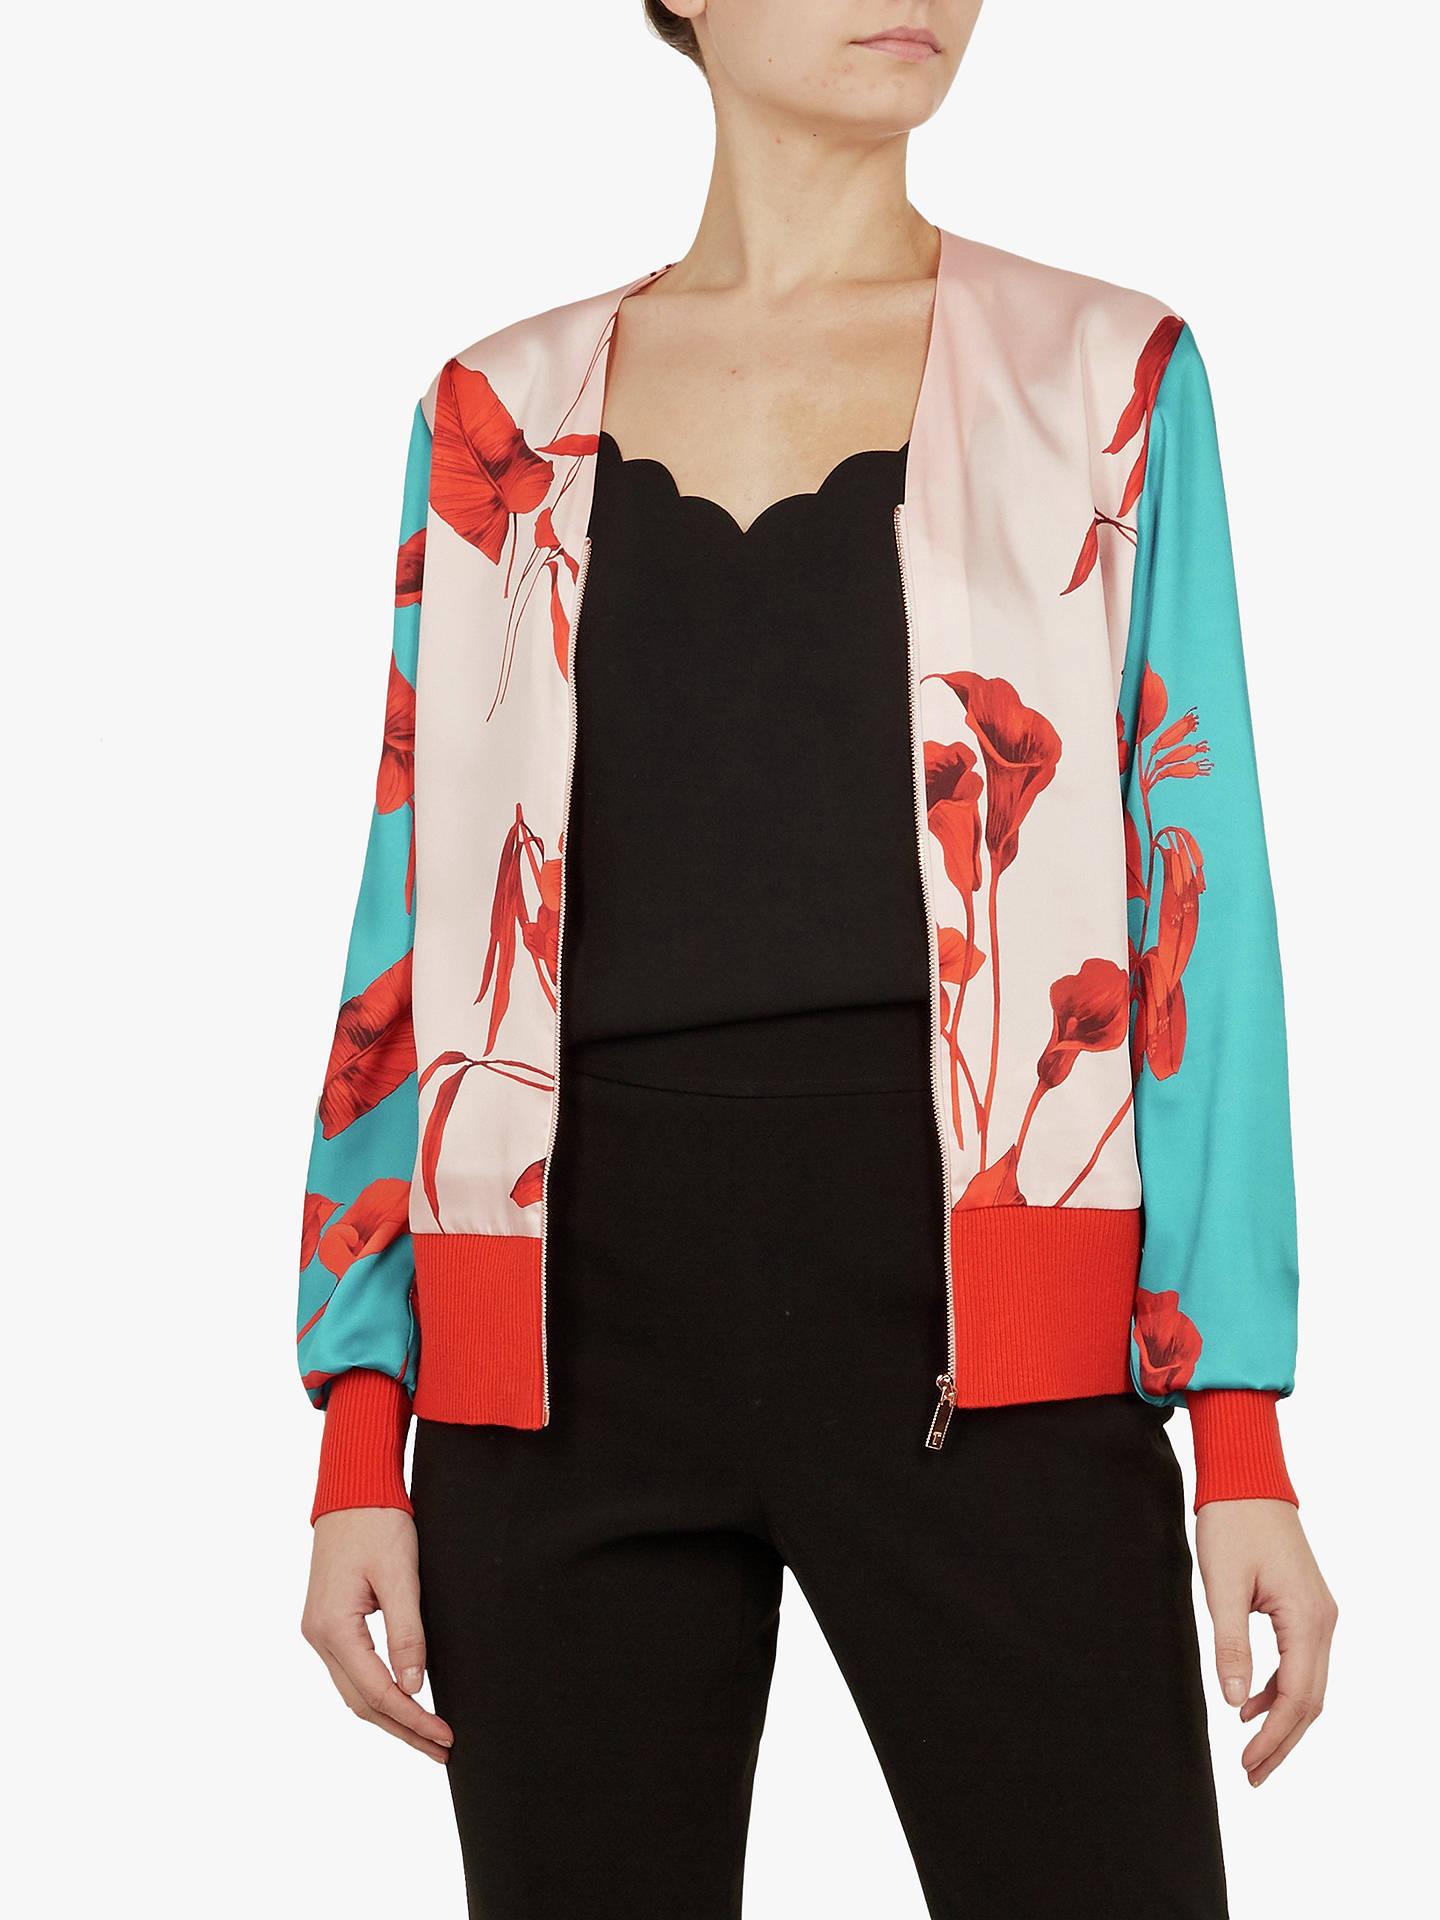 2551498c7 Buy Ted Baker Cortnee Fantasia Knit Bomber Jacket